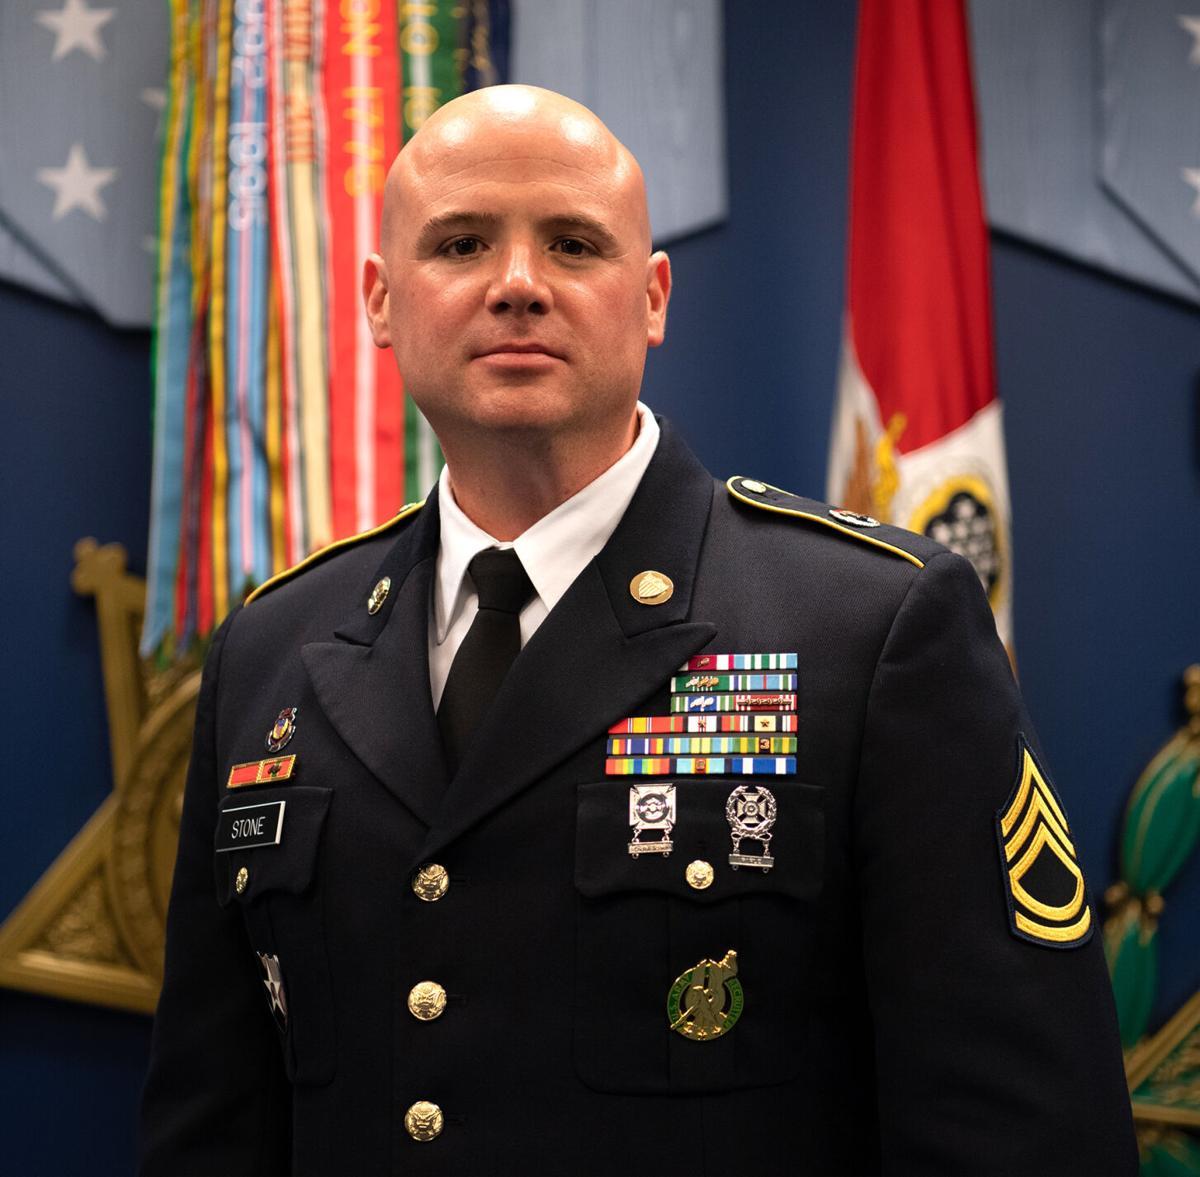 Sgt. 1st Class Michael Joel Stone 1.jpg